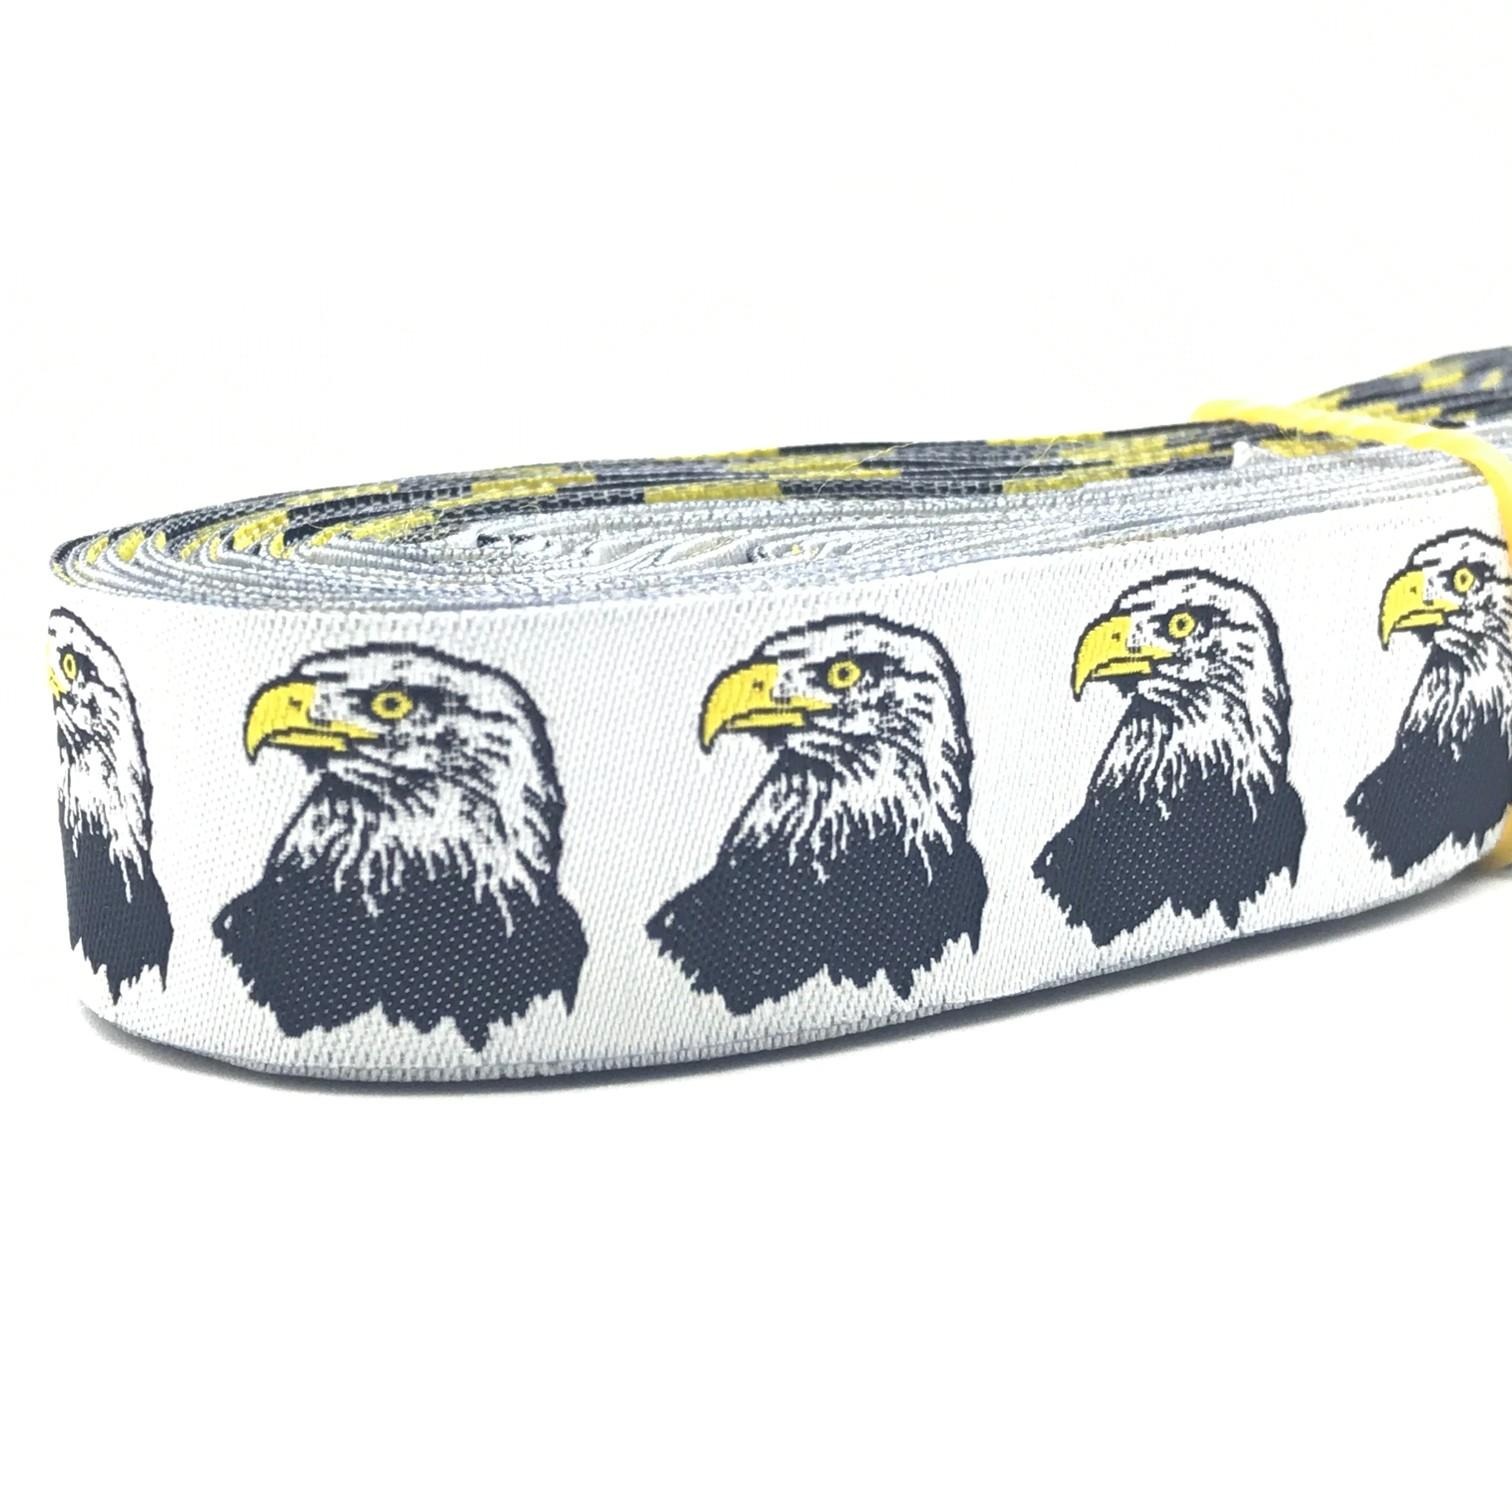 "10 meters 7/8"" 22mm Bald Eagle European Jacquard Ribbon For Dog Collar"